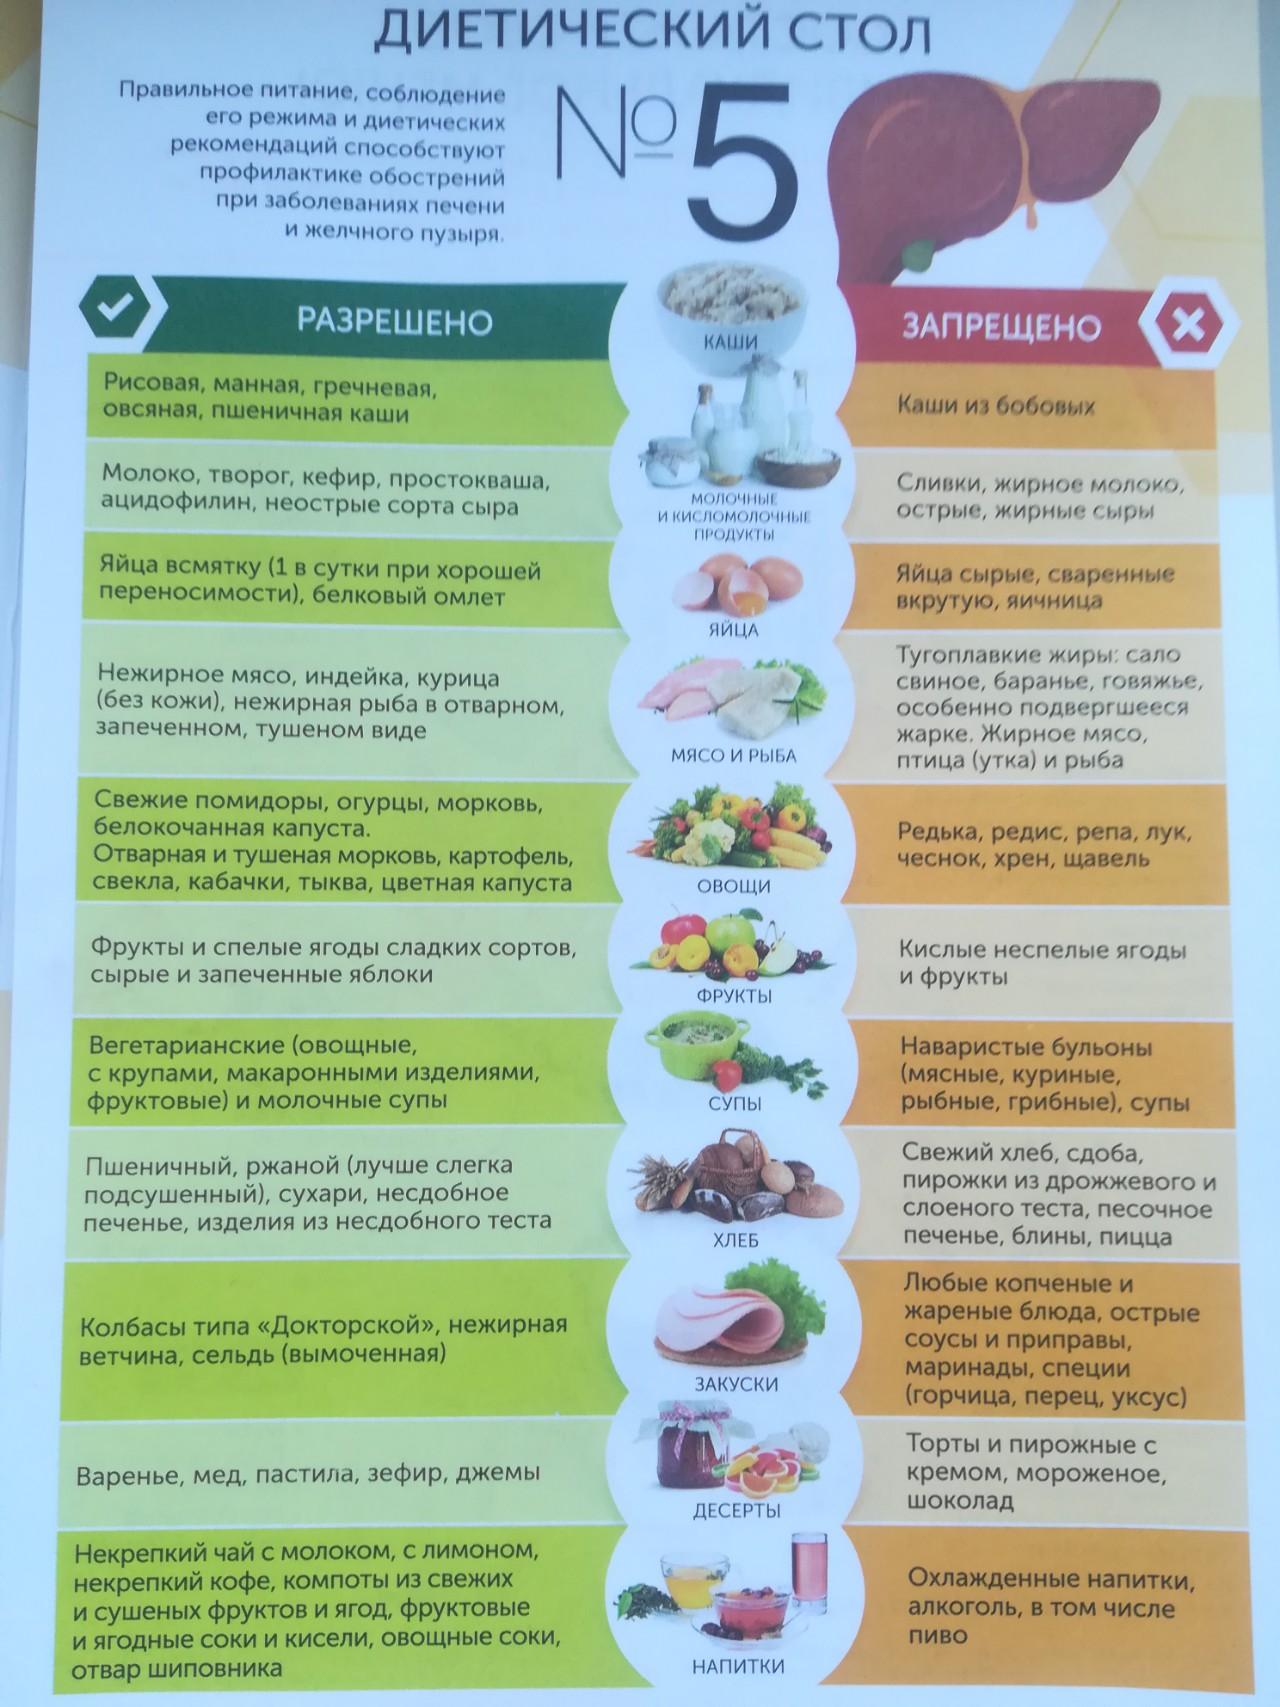 Какое меню при диете 5 стол